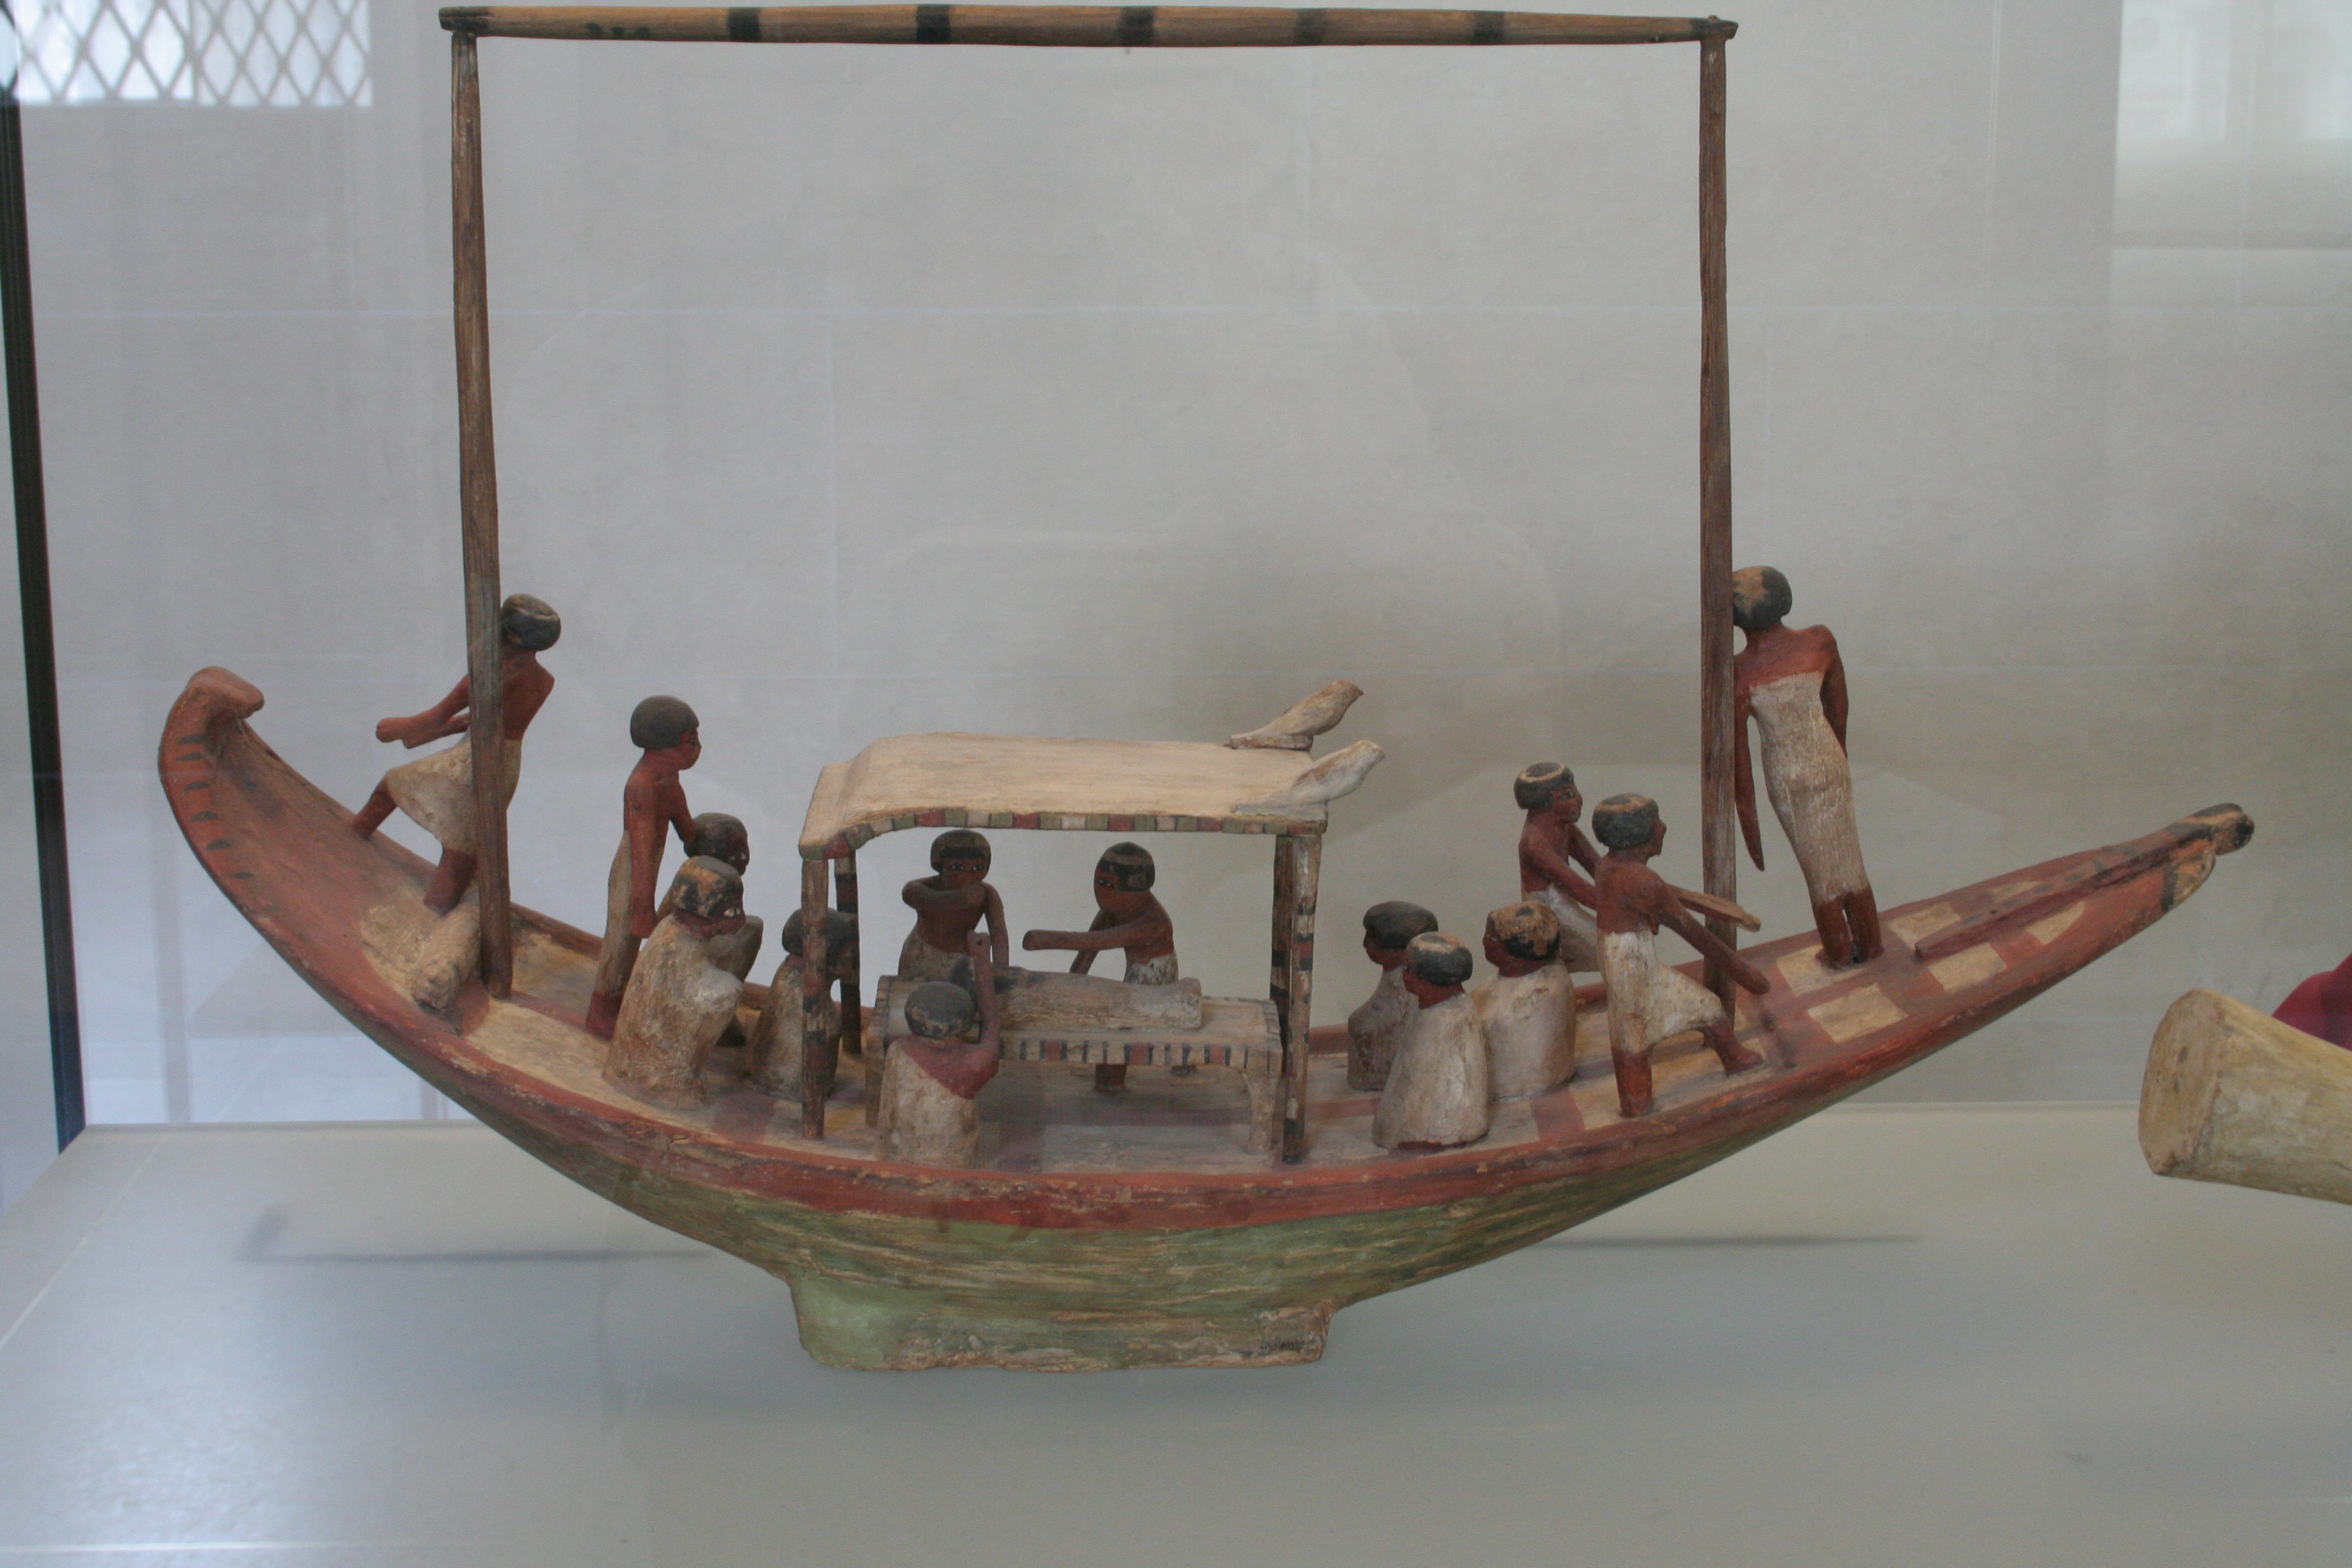 http://upload.wikimedia.org/wikipedia/commons/7/7f/Louvre_modele_bateau.JPG